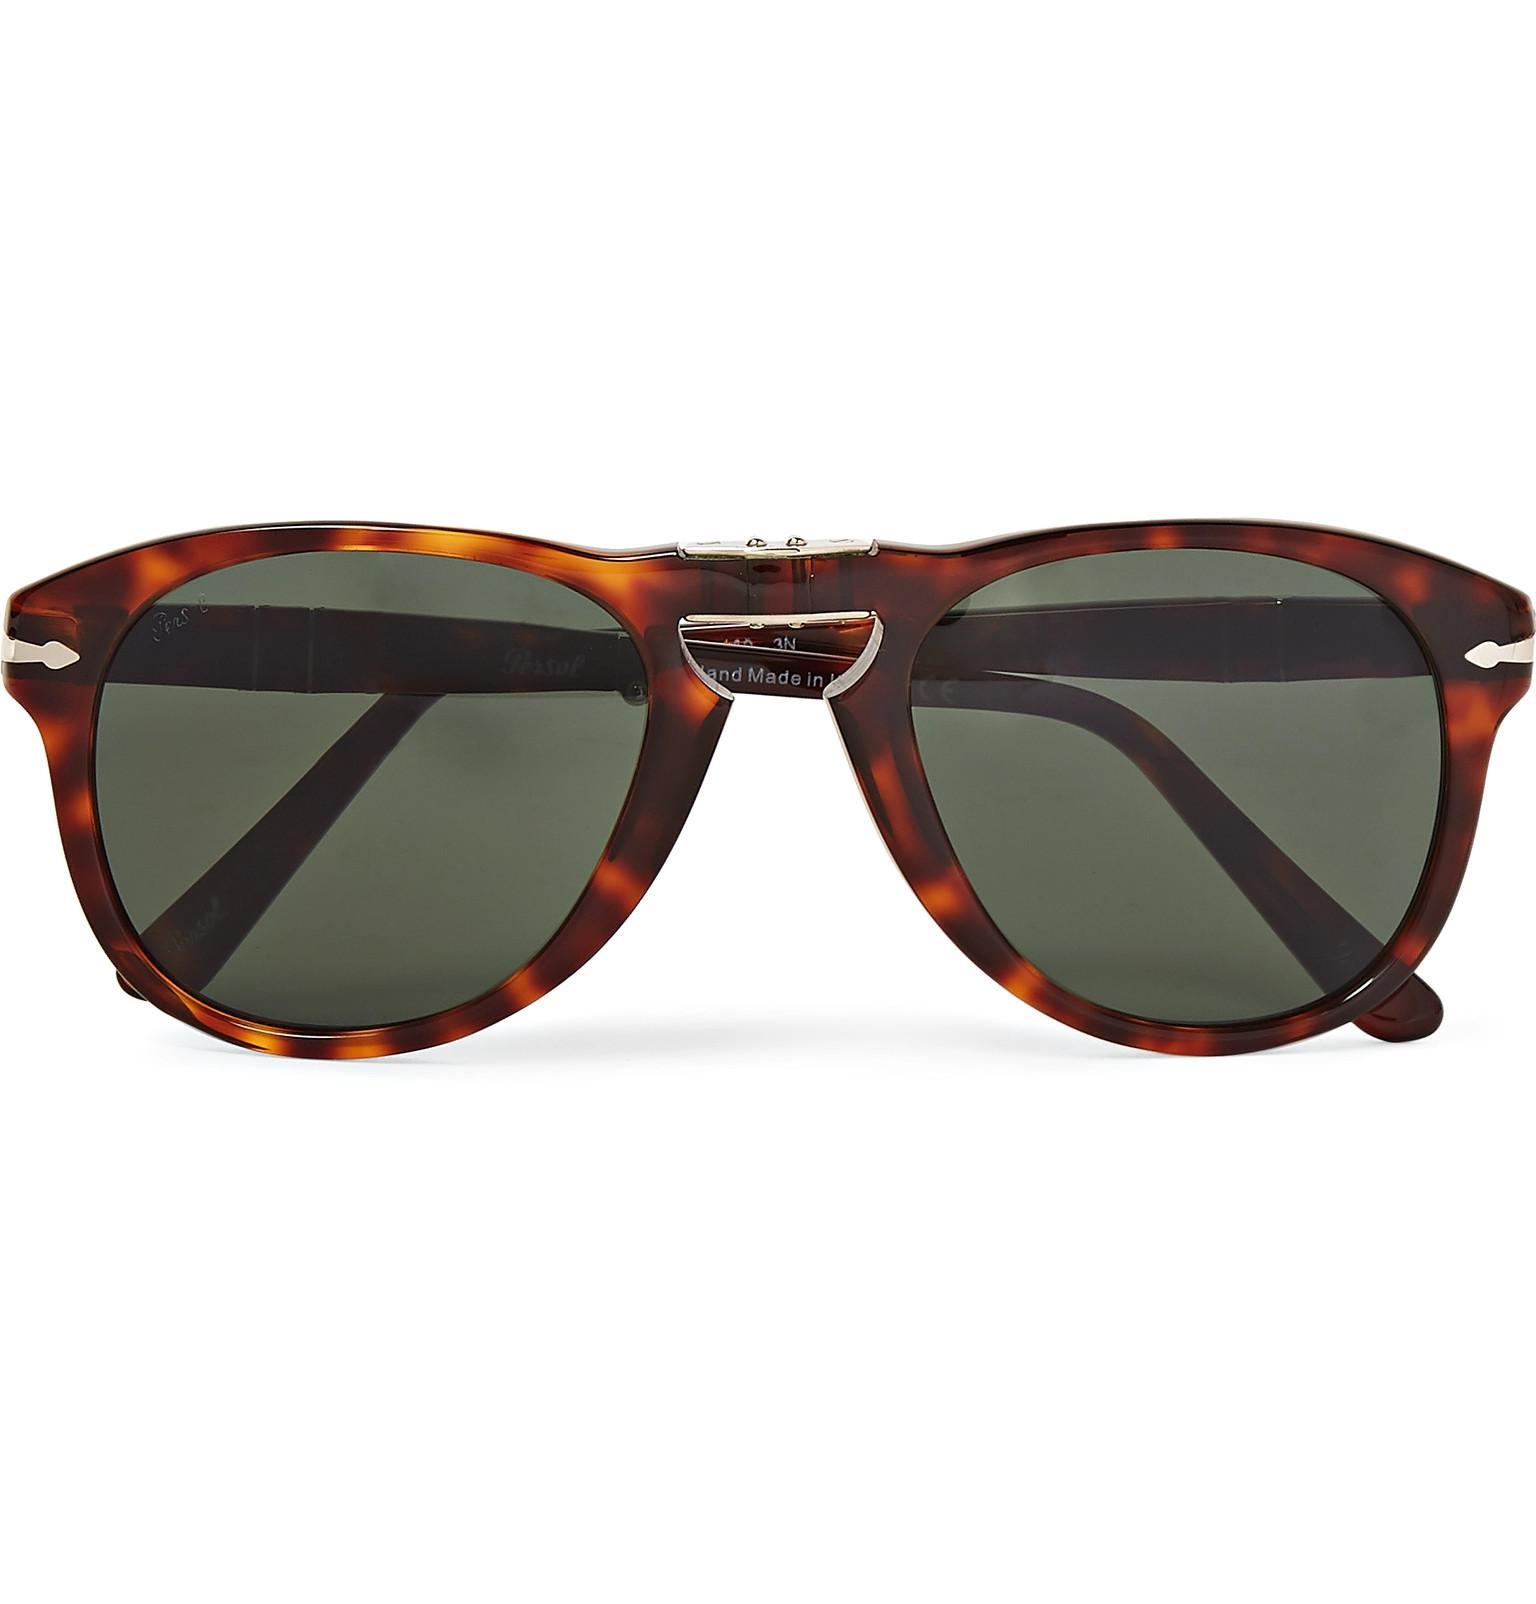 d78b74ac8f Lyst - Persol 714 Folding D-frame Acetate Sunglasses in Brown for Men